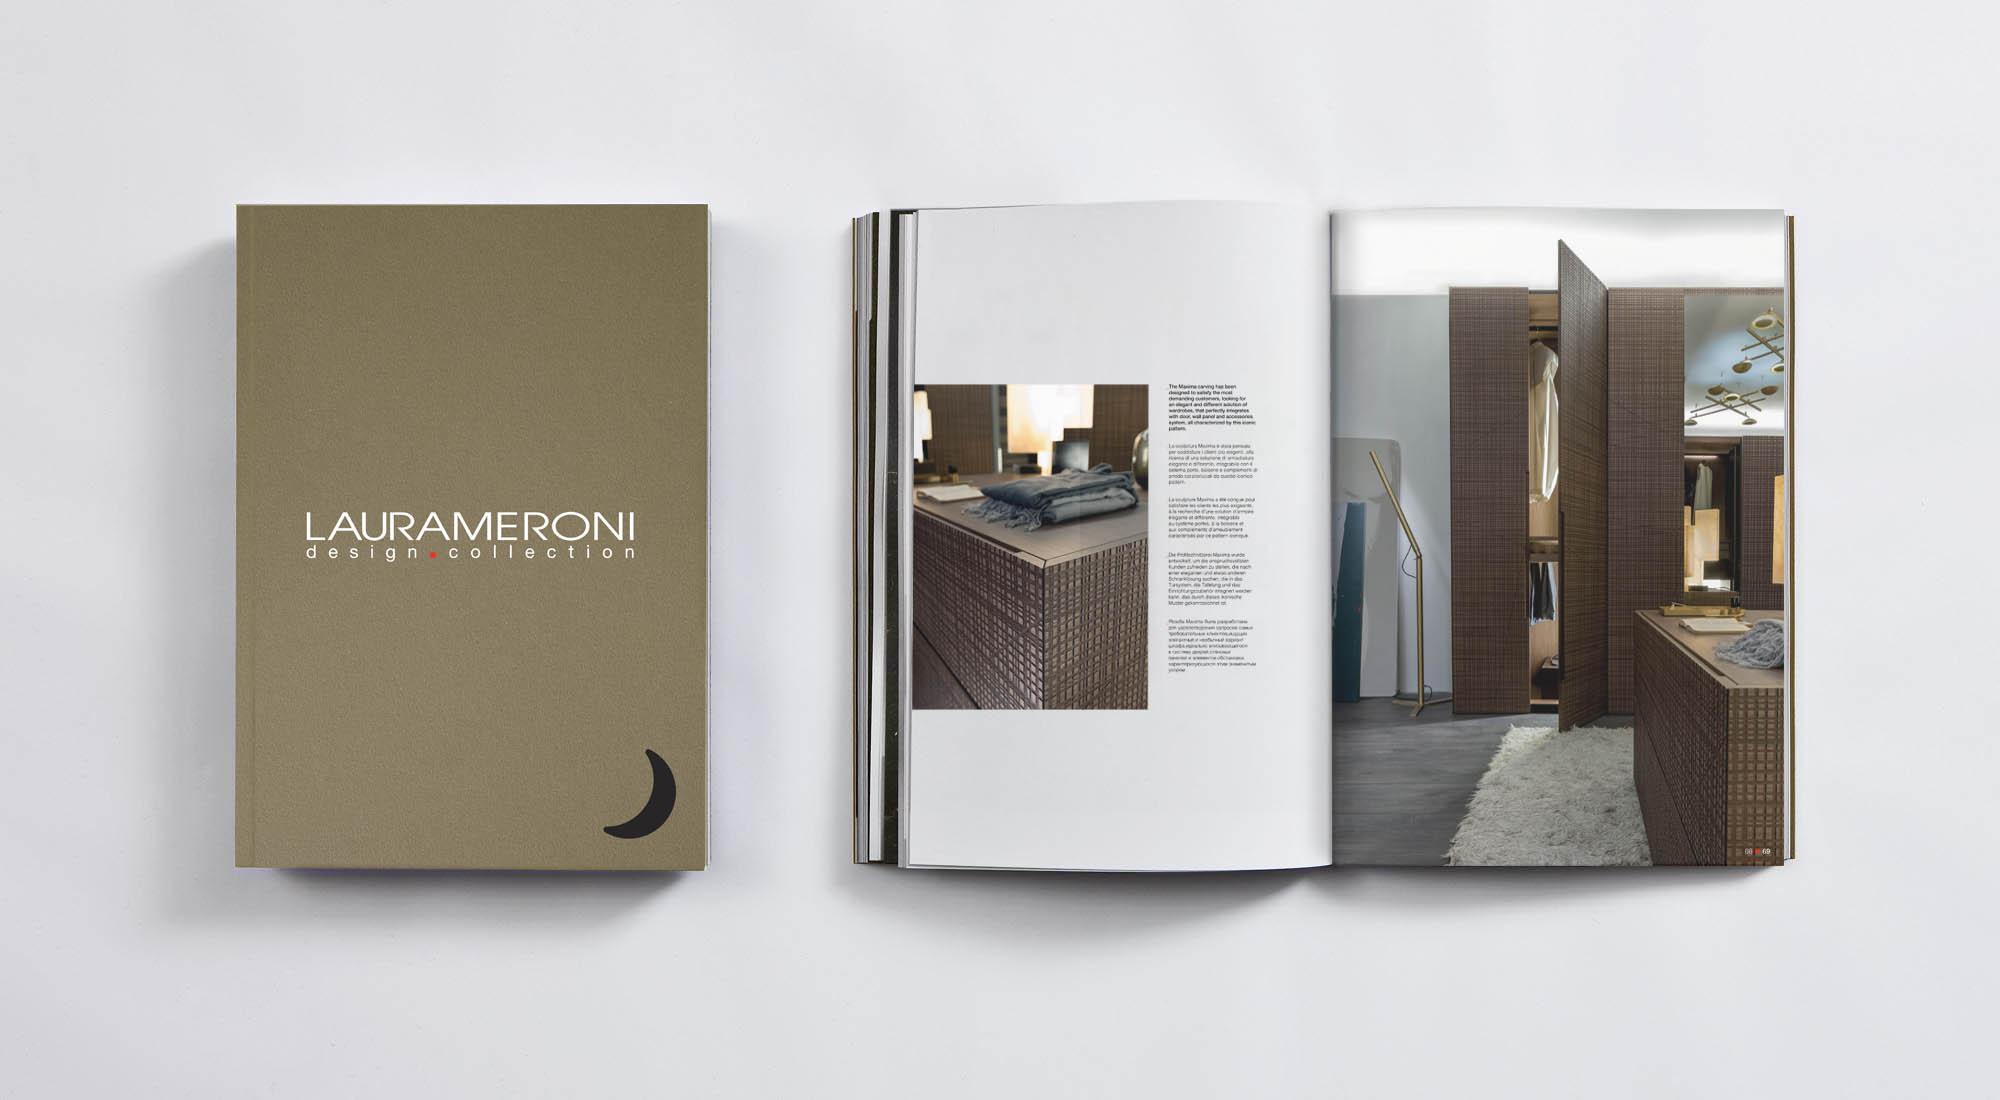 laurameroni luxury high-end bedroom interior design catalogue free download